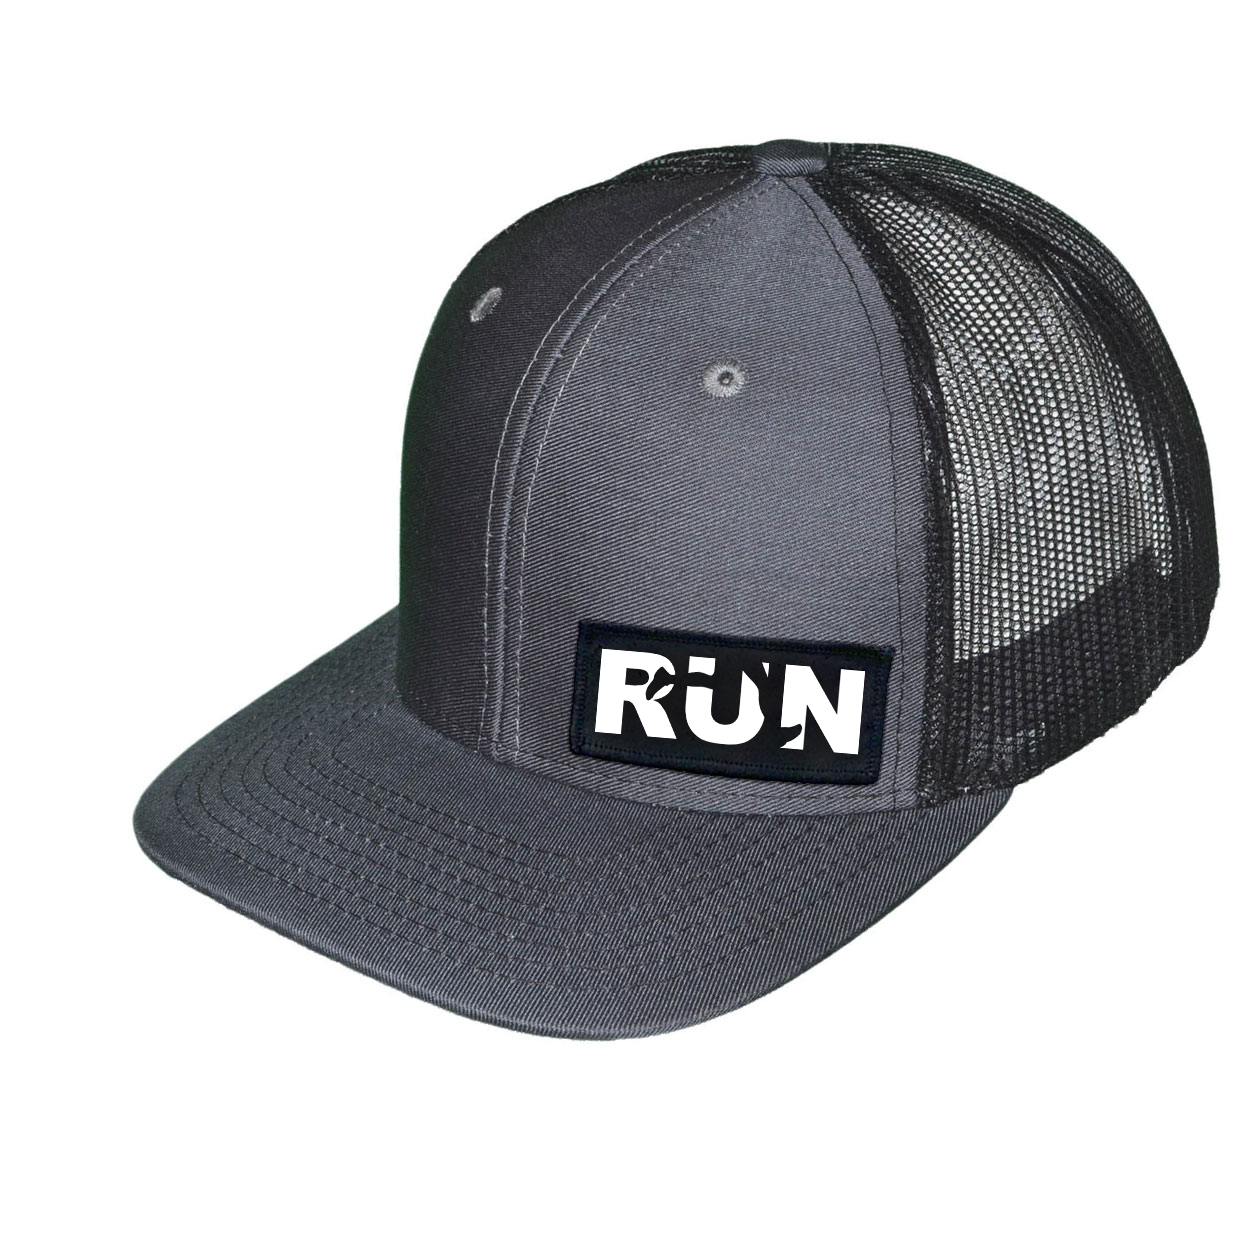 Run Jog Logo Night Out Woven Patch Snapback Trucker Hat Dark Gray/Black (White Logo)